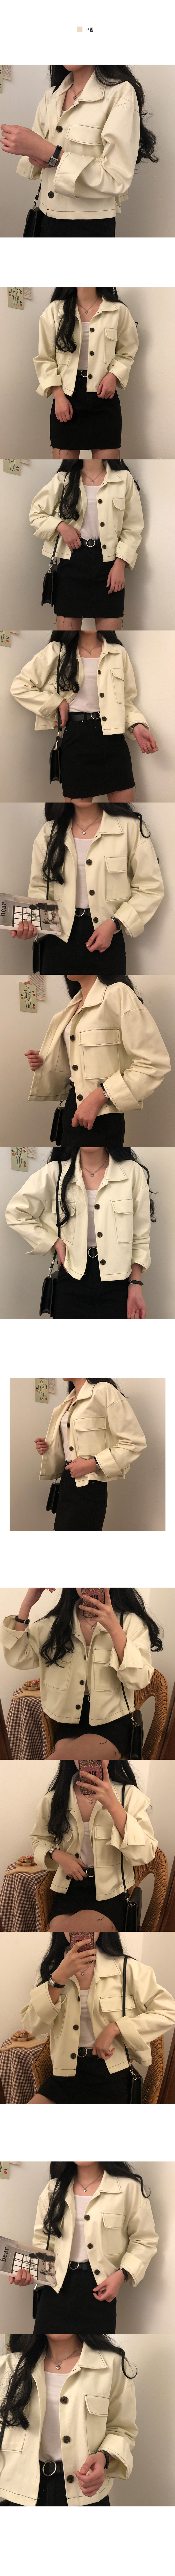 Benjamin Boxy stitch cropped jacket